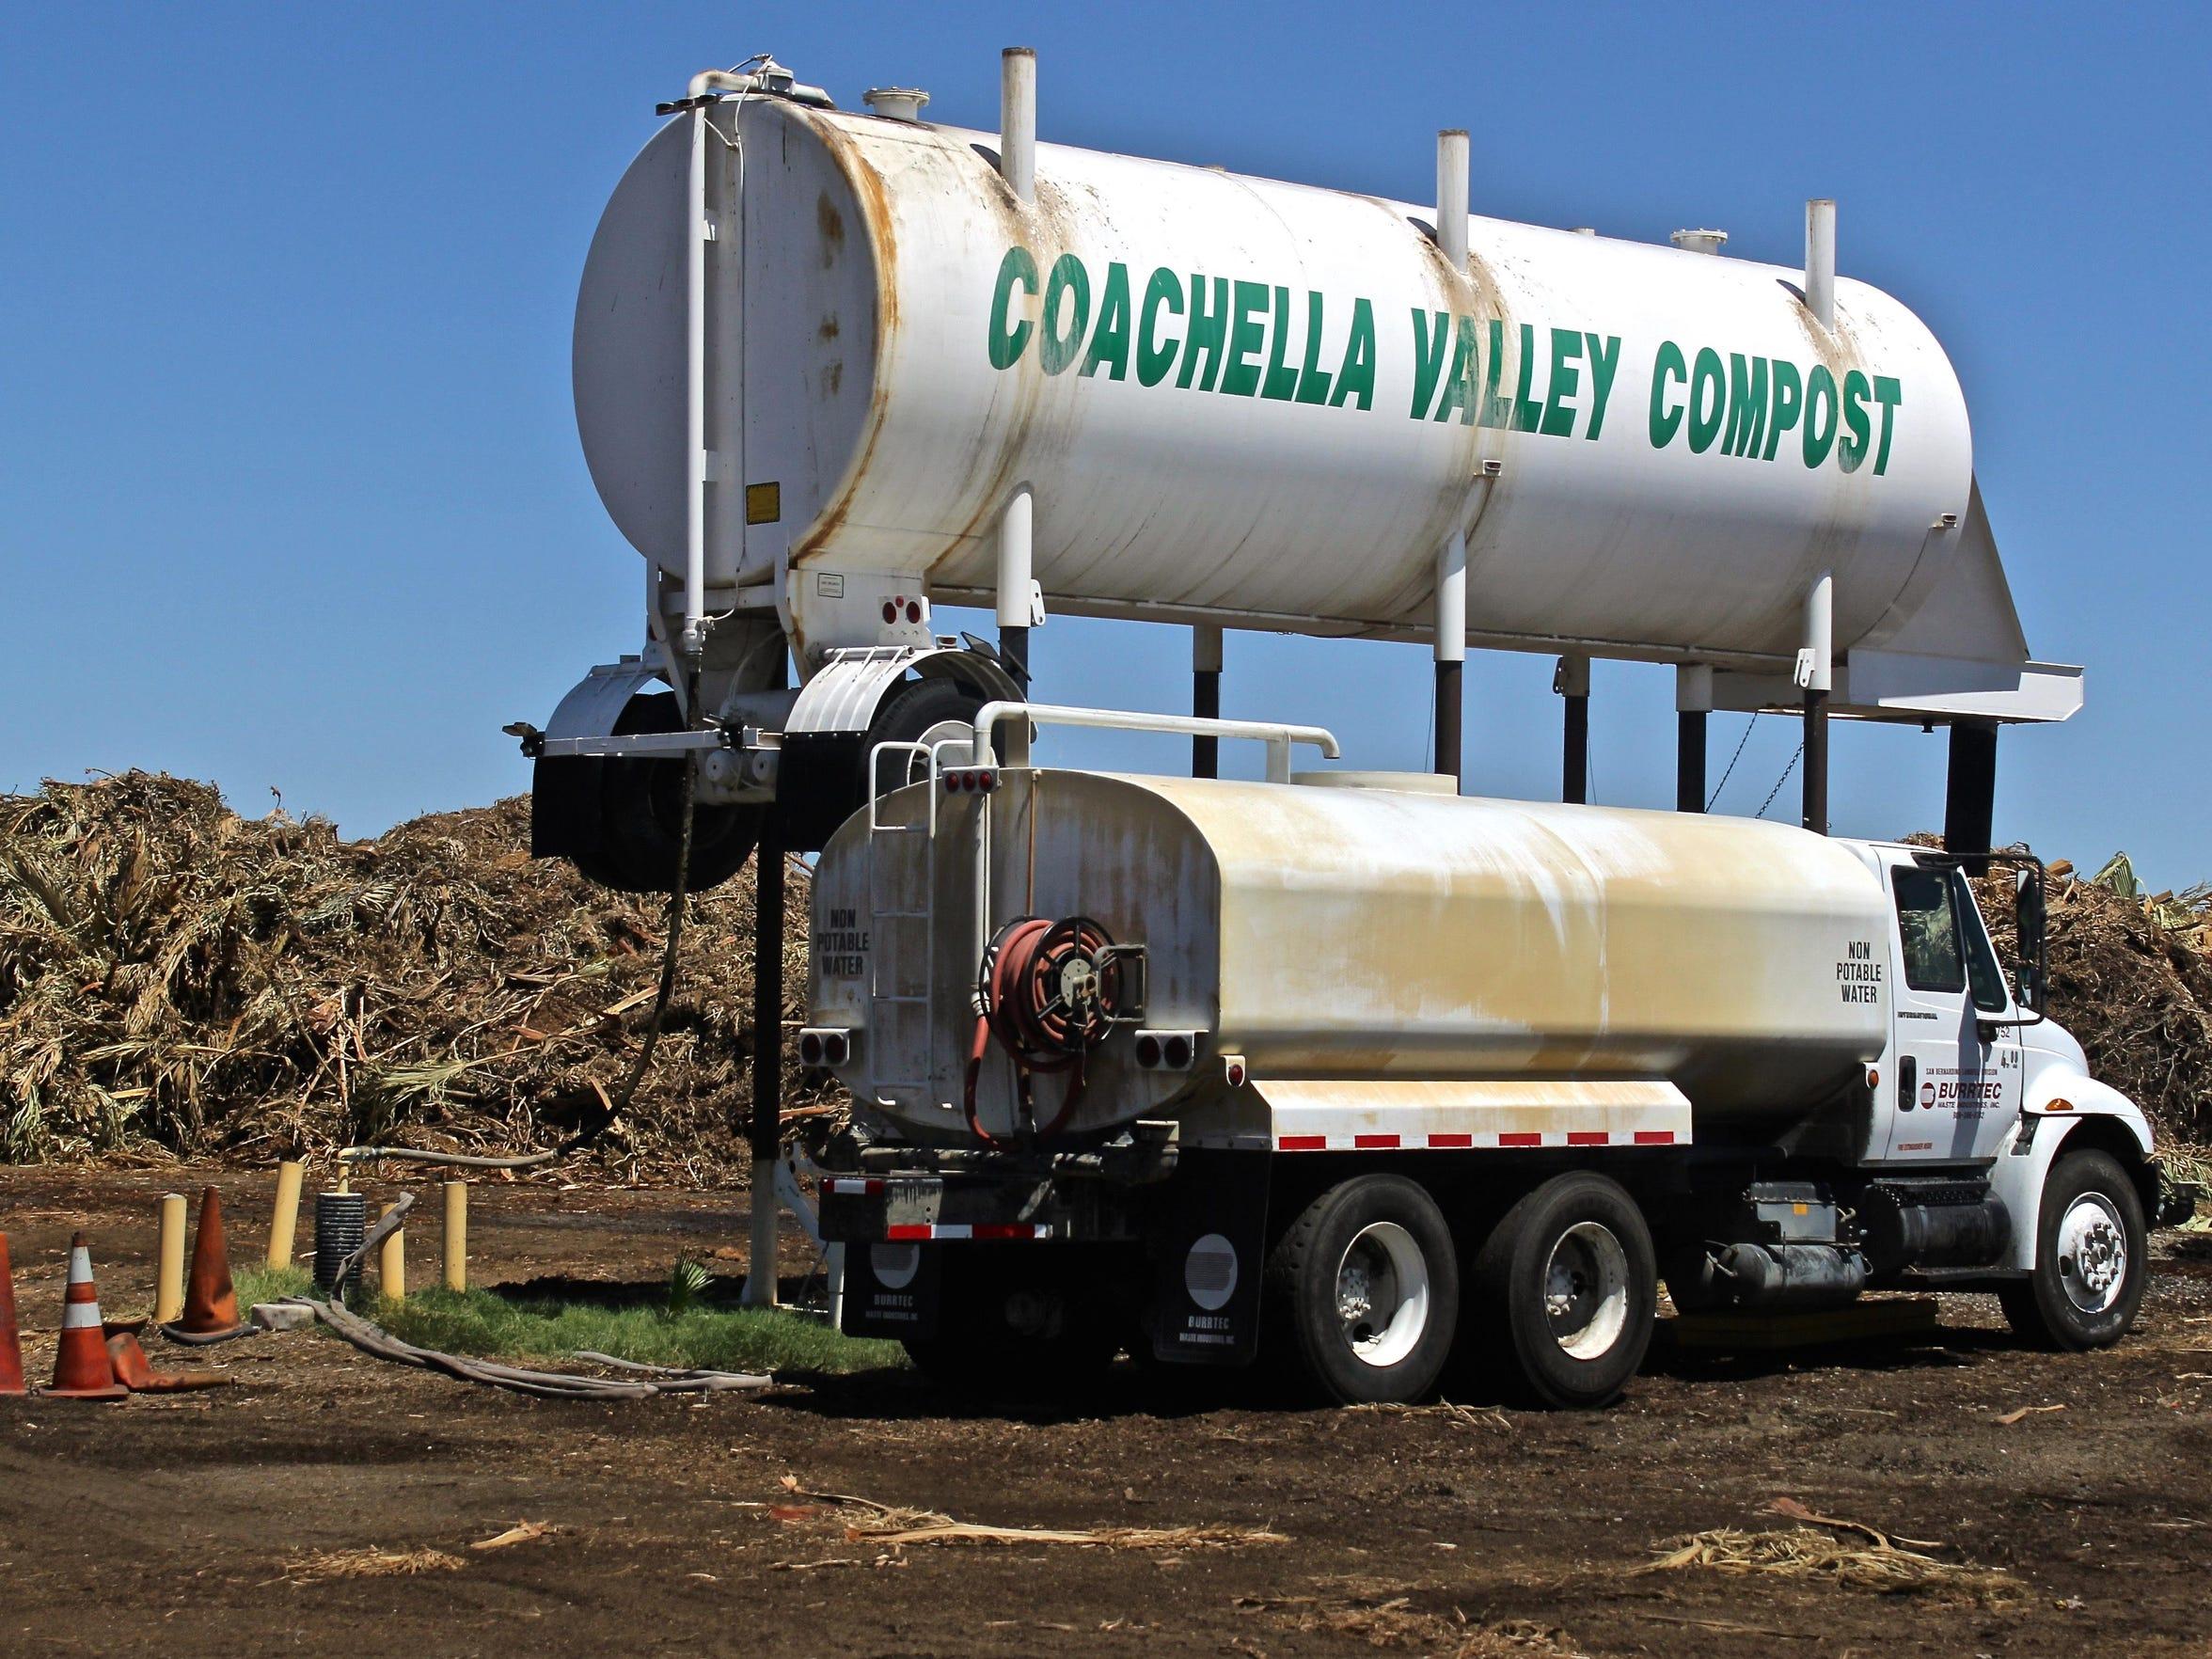 4- Coachella Valley Compost